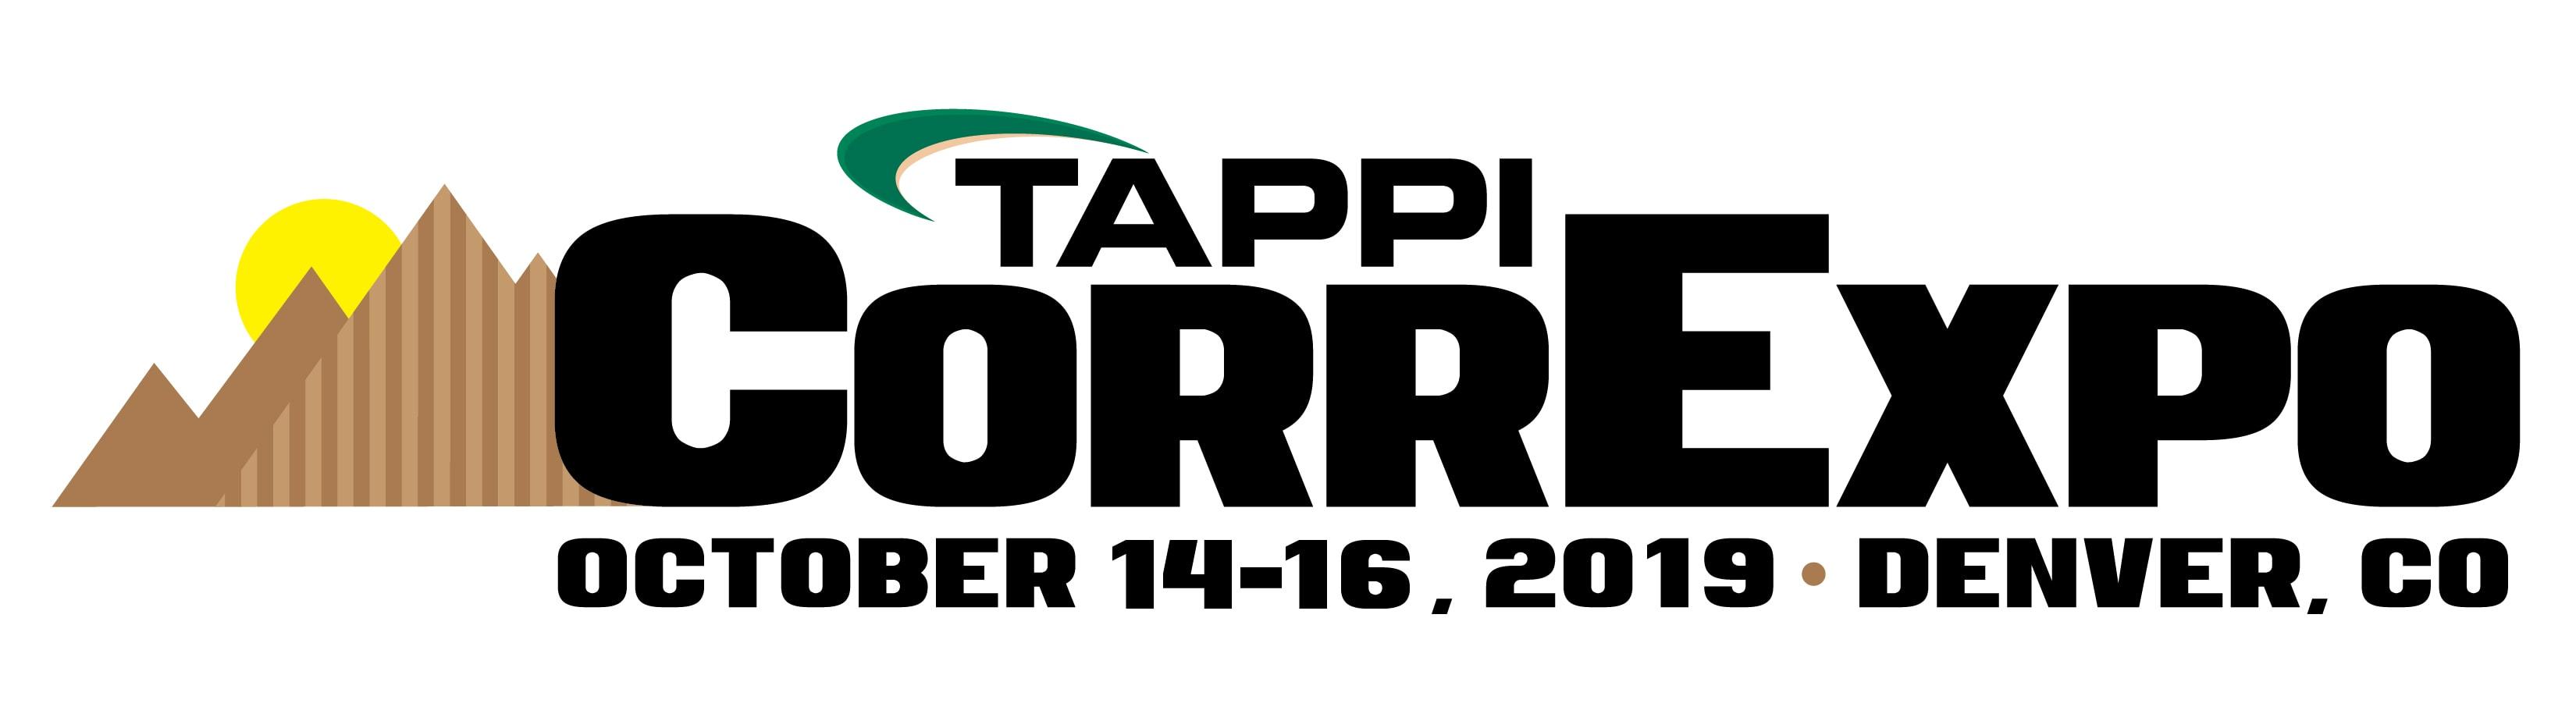 CorrExpo Week Oct 14-16, 2019